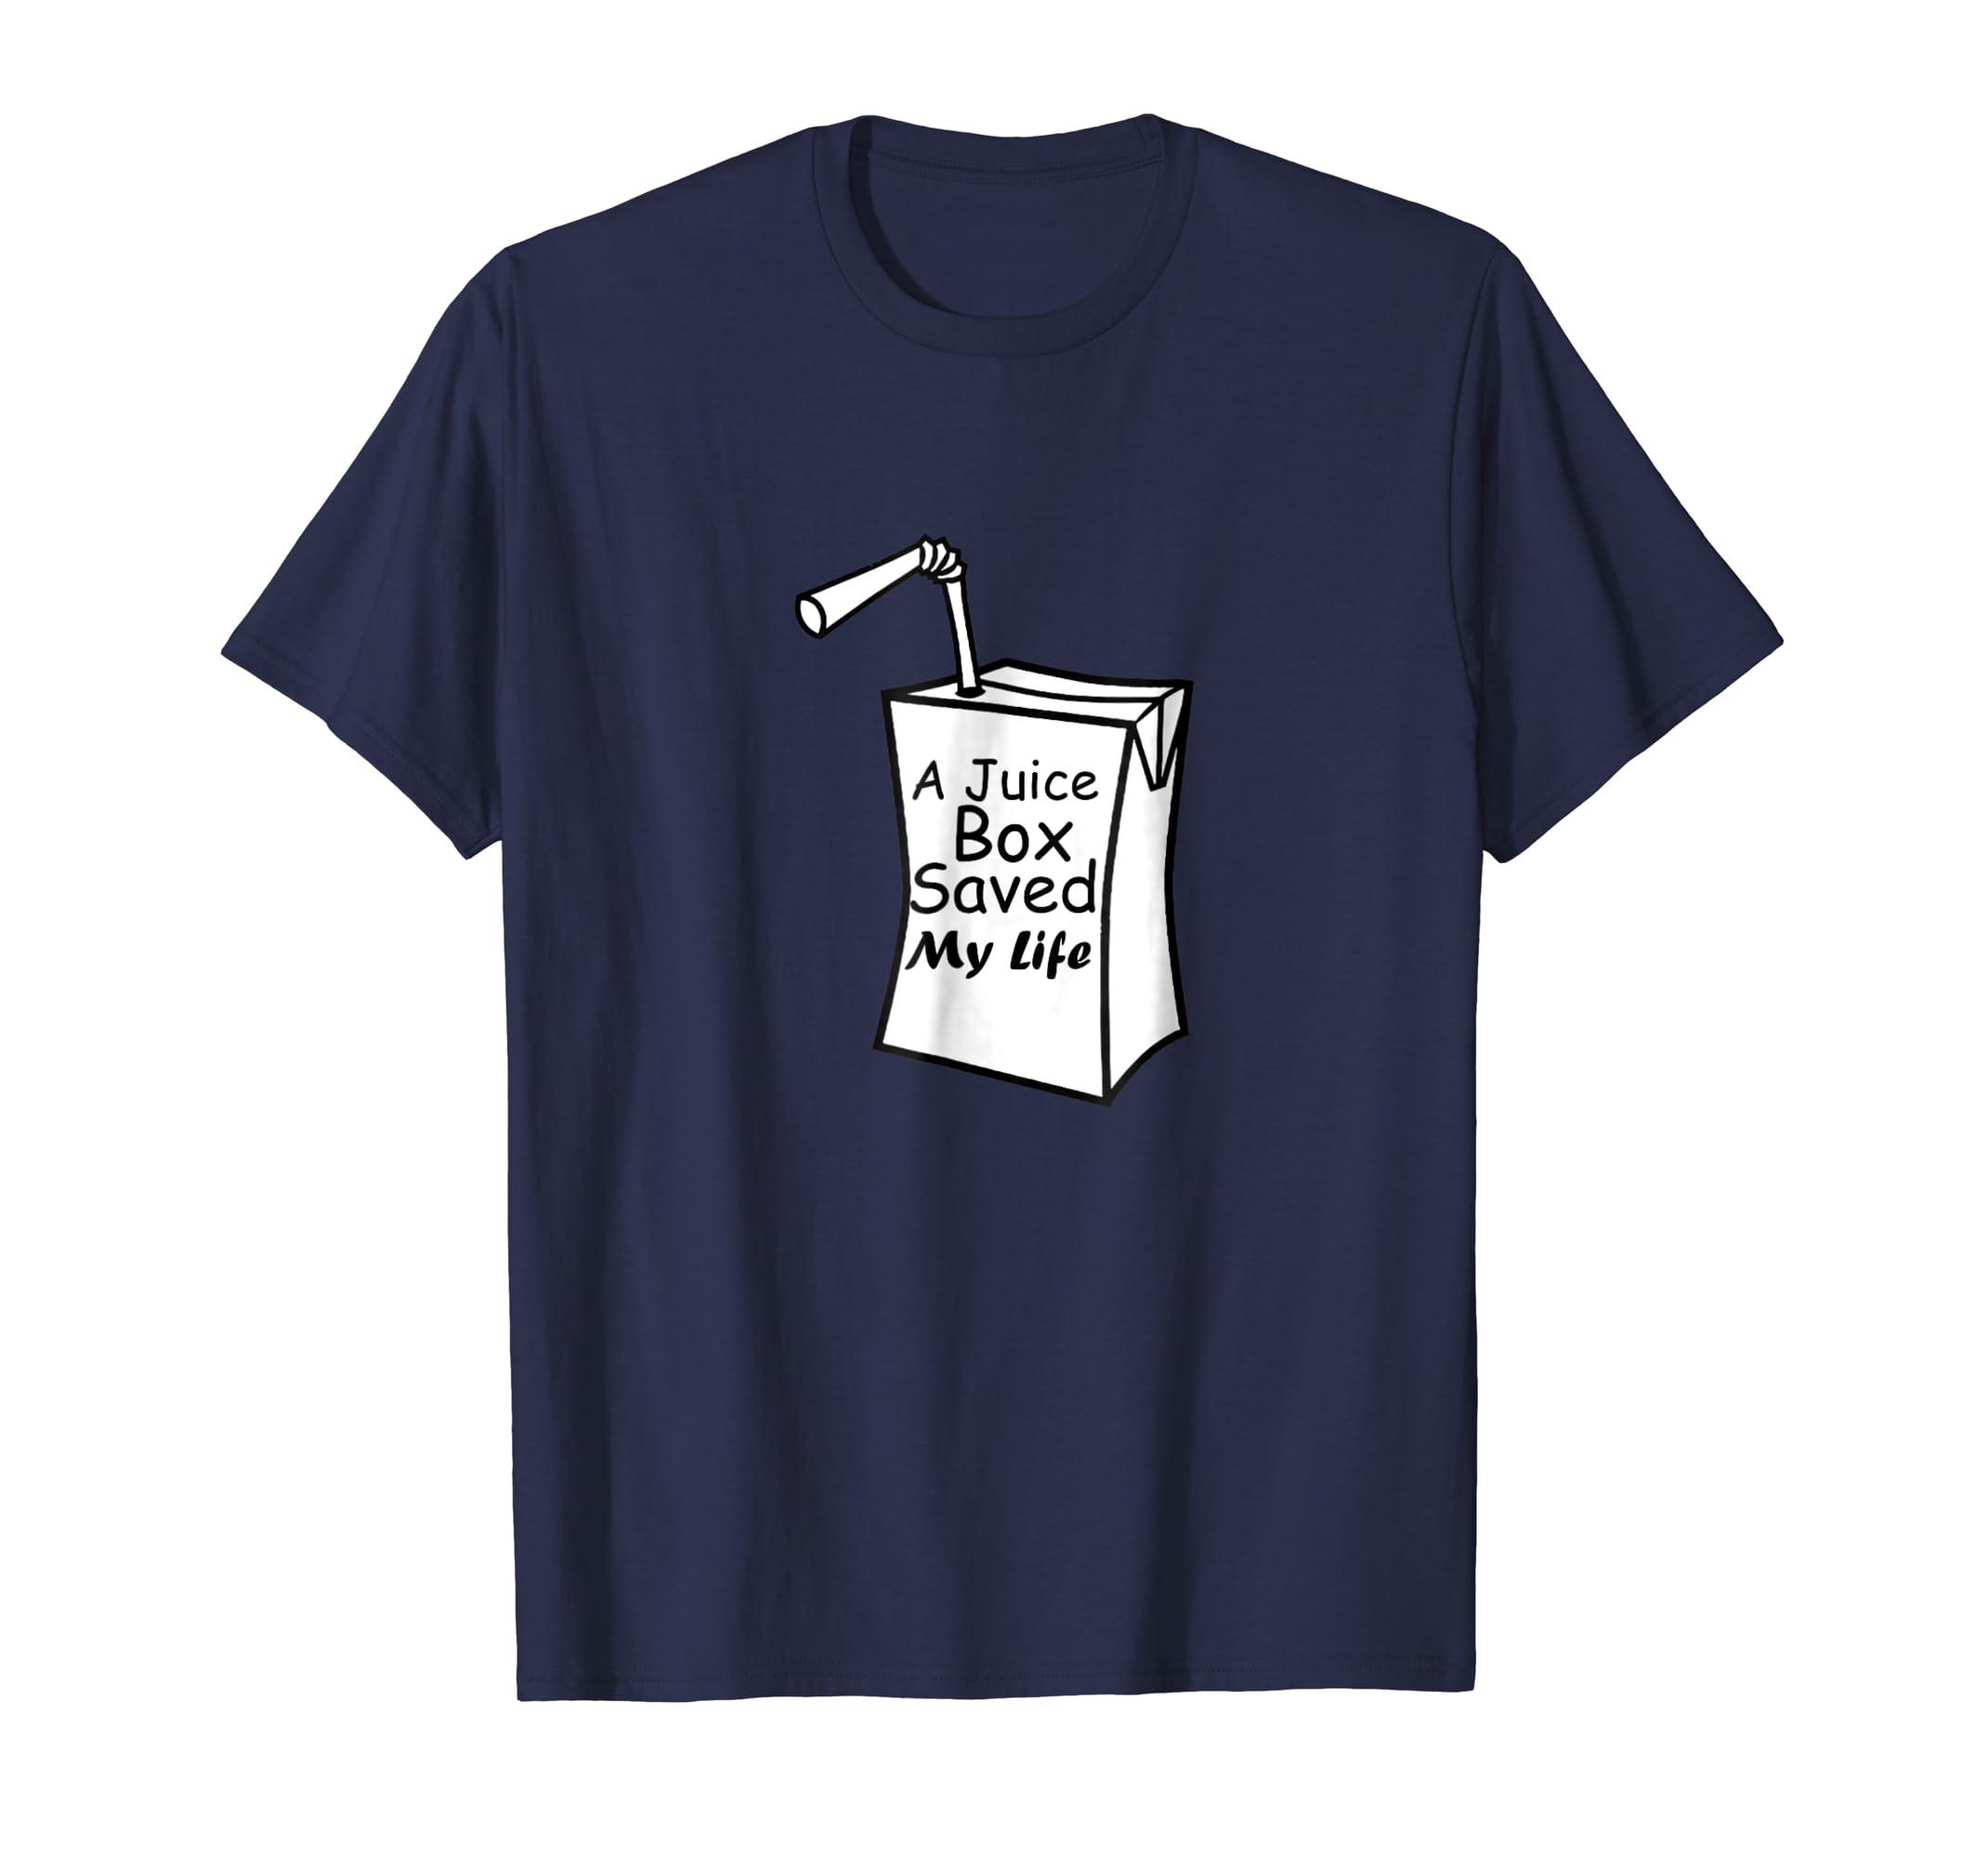 Juice Box Saved My Life T shirt Type 1 Diabetes-azvn